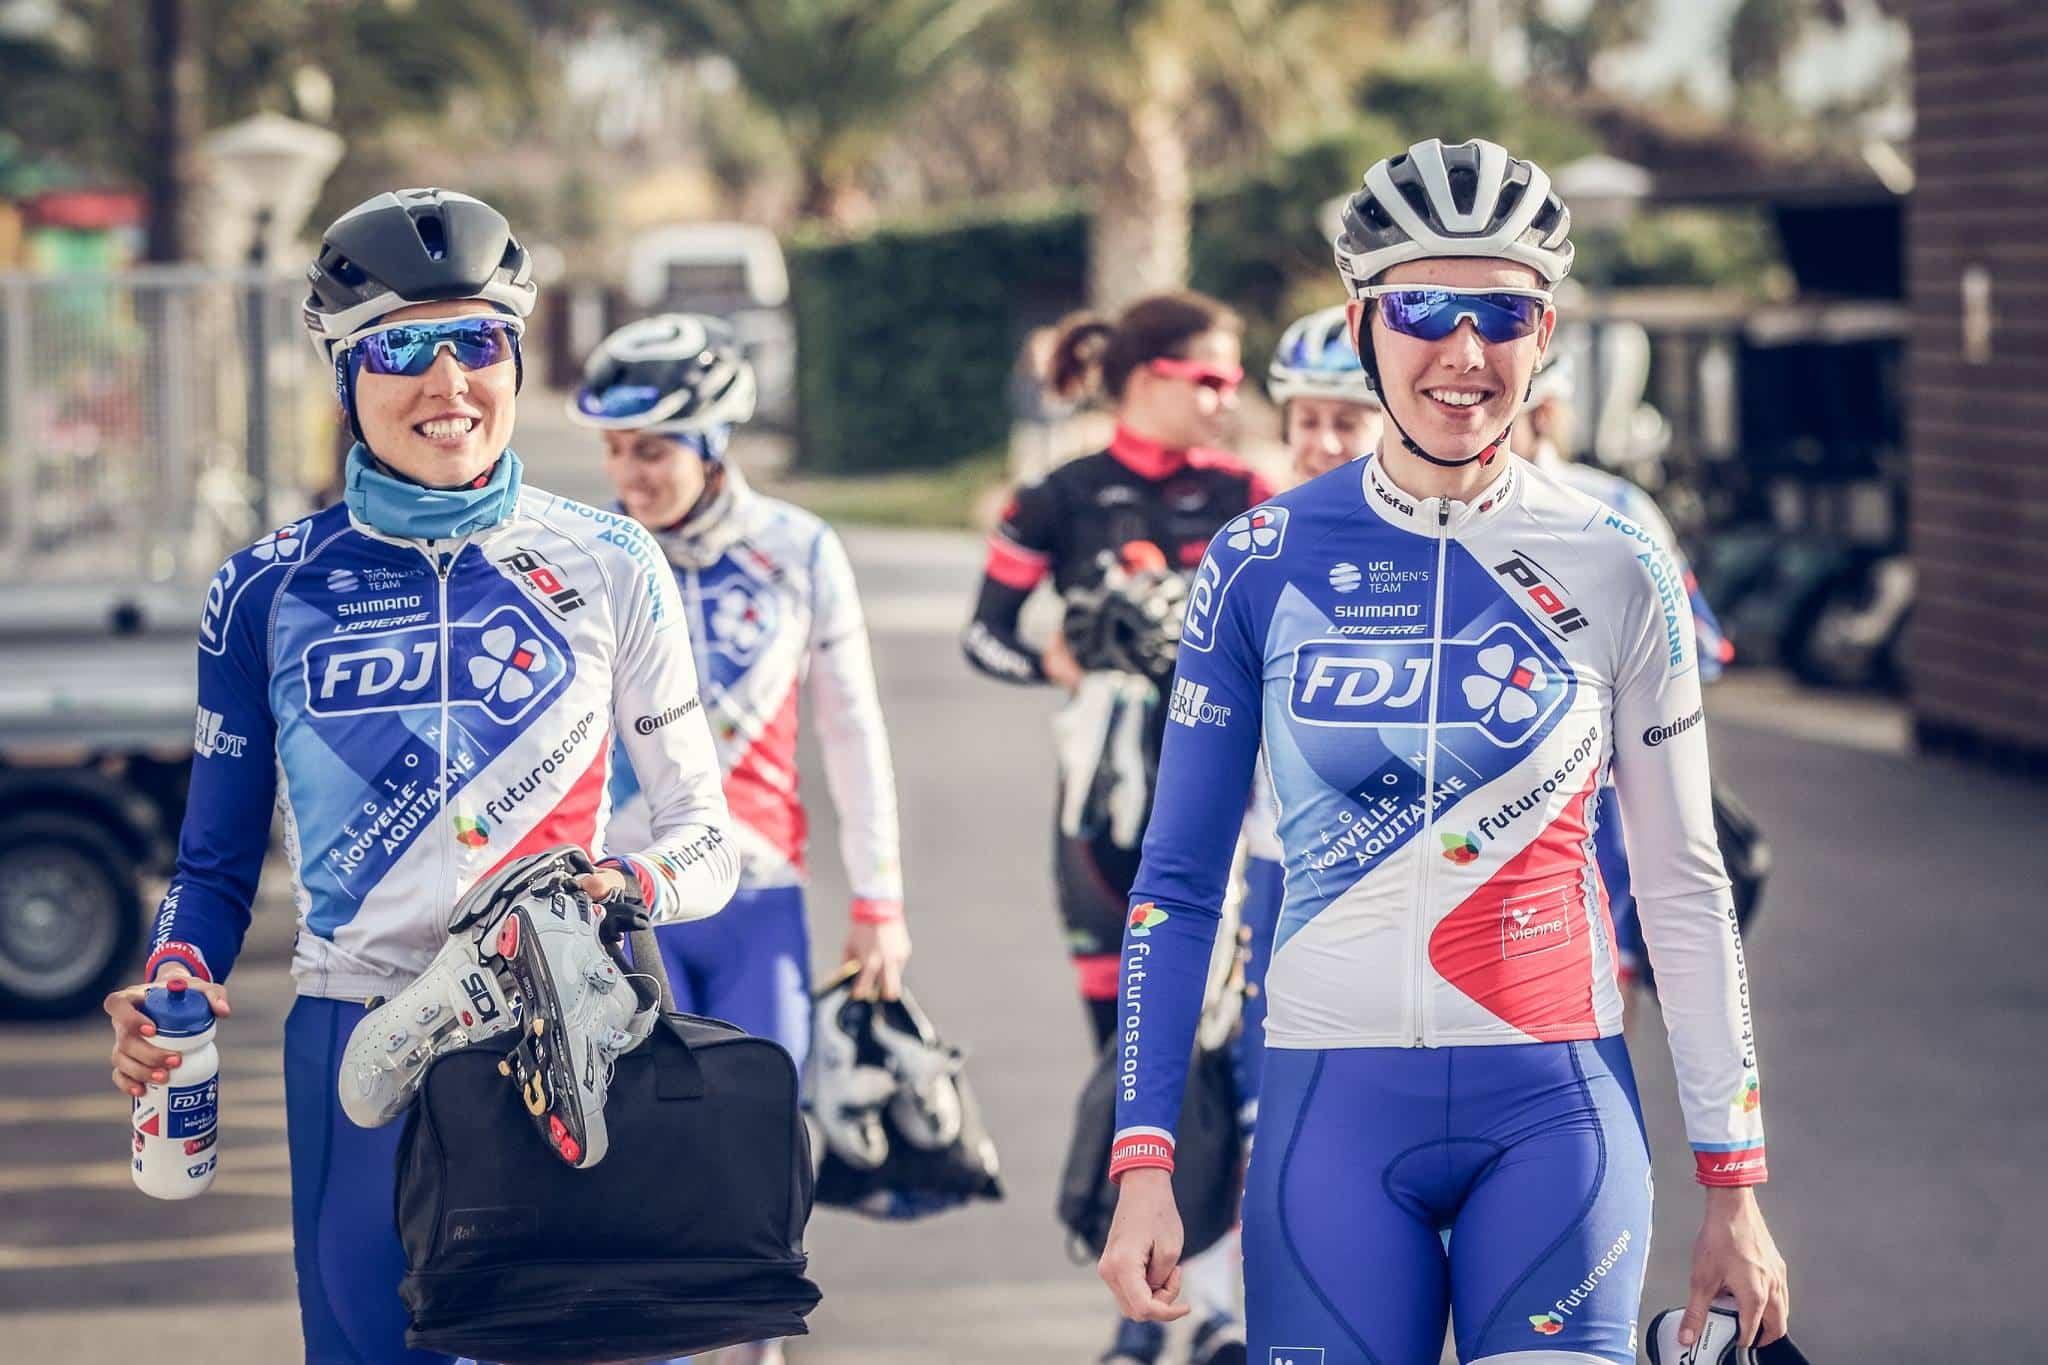 equipe cycliste féminine - FDJ - Nouvelle Aquitaine - Futuroscope